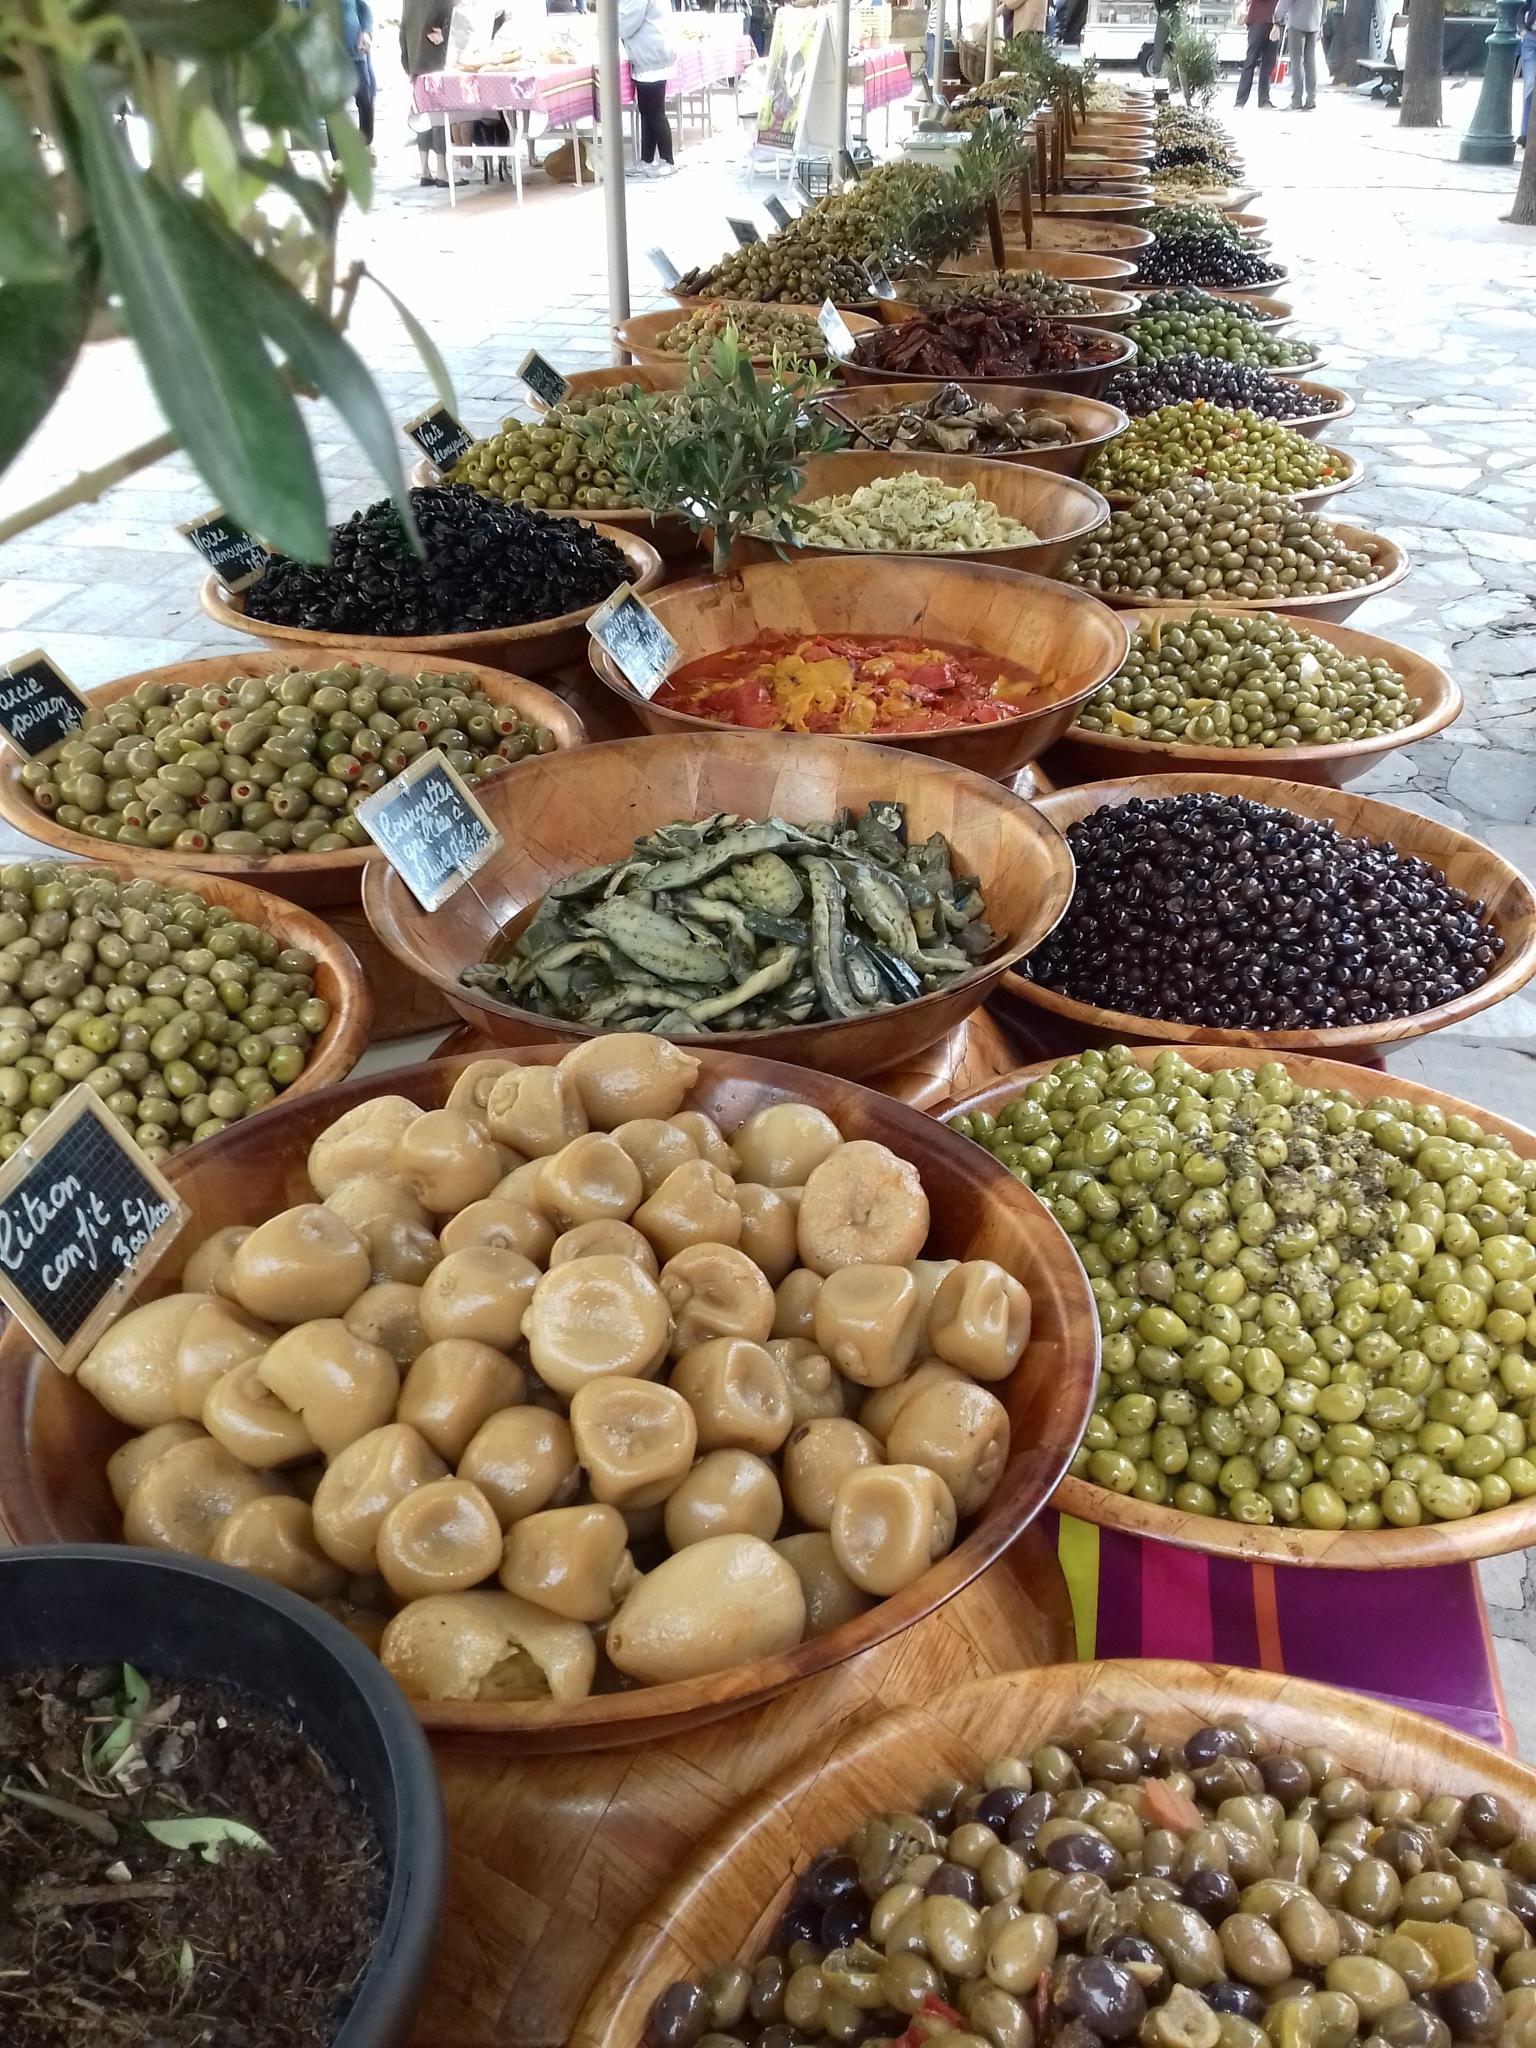 Ajaccio market by lambertxavbis